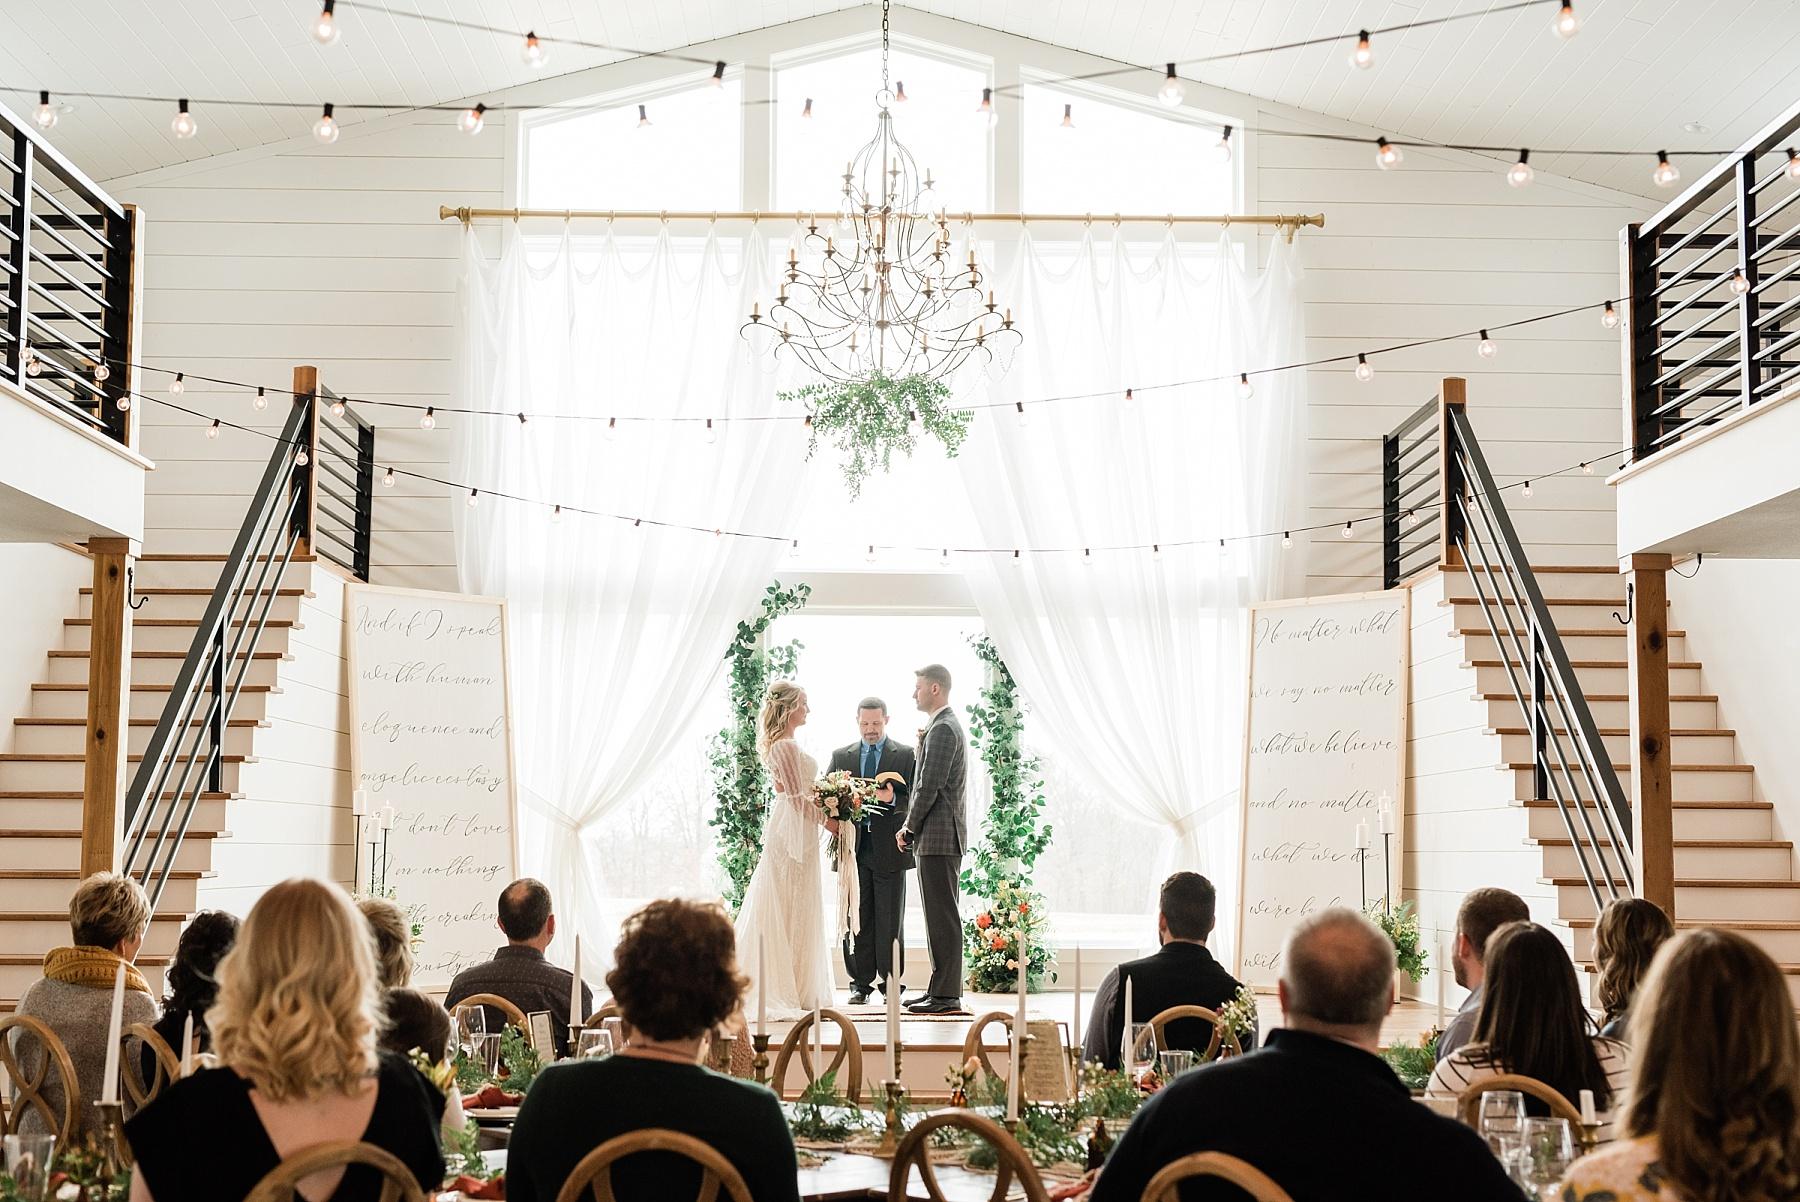 Eclectic Scandinavian Winter Wedding in All White Venue Emerson Fields by Kelsi Kliethermes Photography Best Missouri and Maui Wedding Photographer_0036.jpg